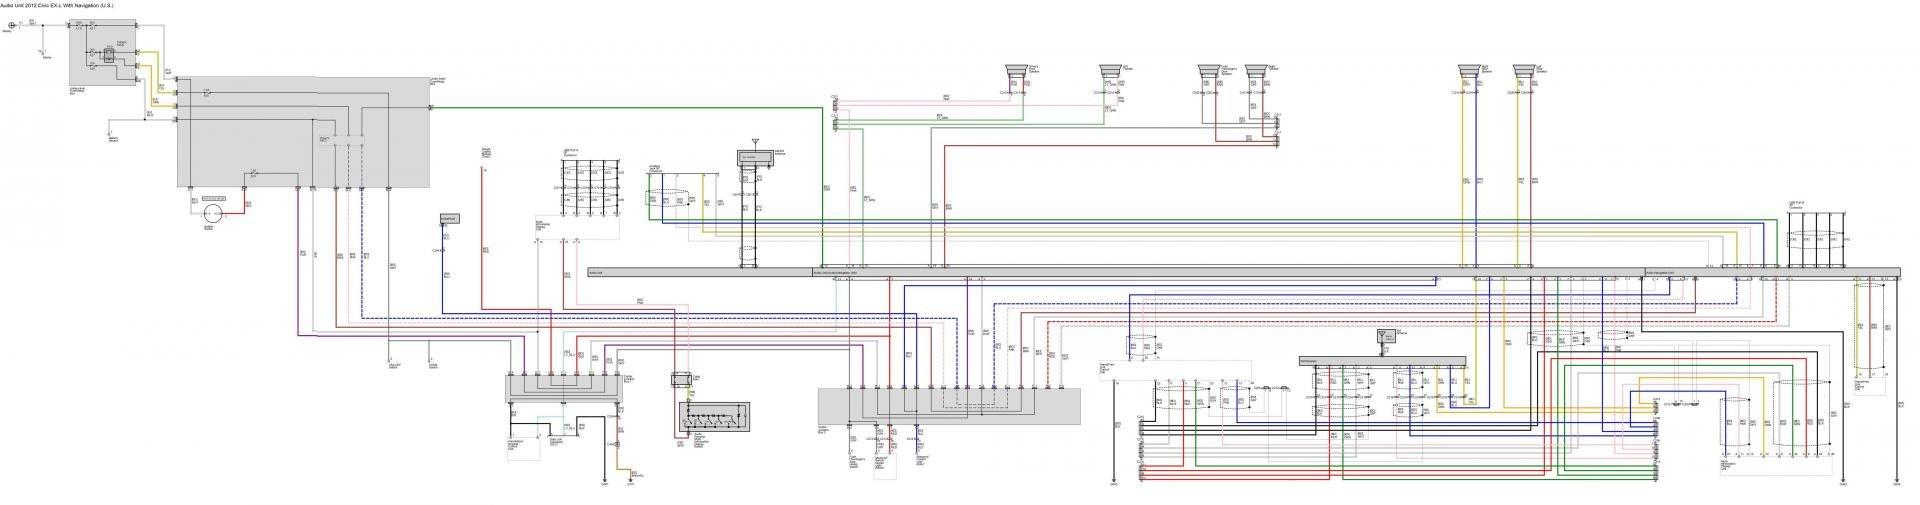 Illusion Carbon C6 Wiring Diagram Schematic Diagrams 2006 Chevy Trailblazer Alternator Plug Audio Post Em If You Got